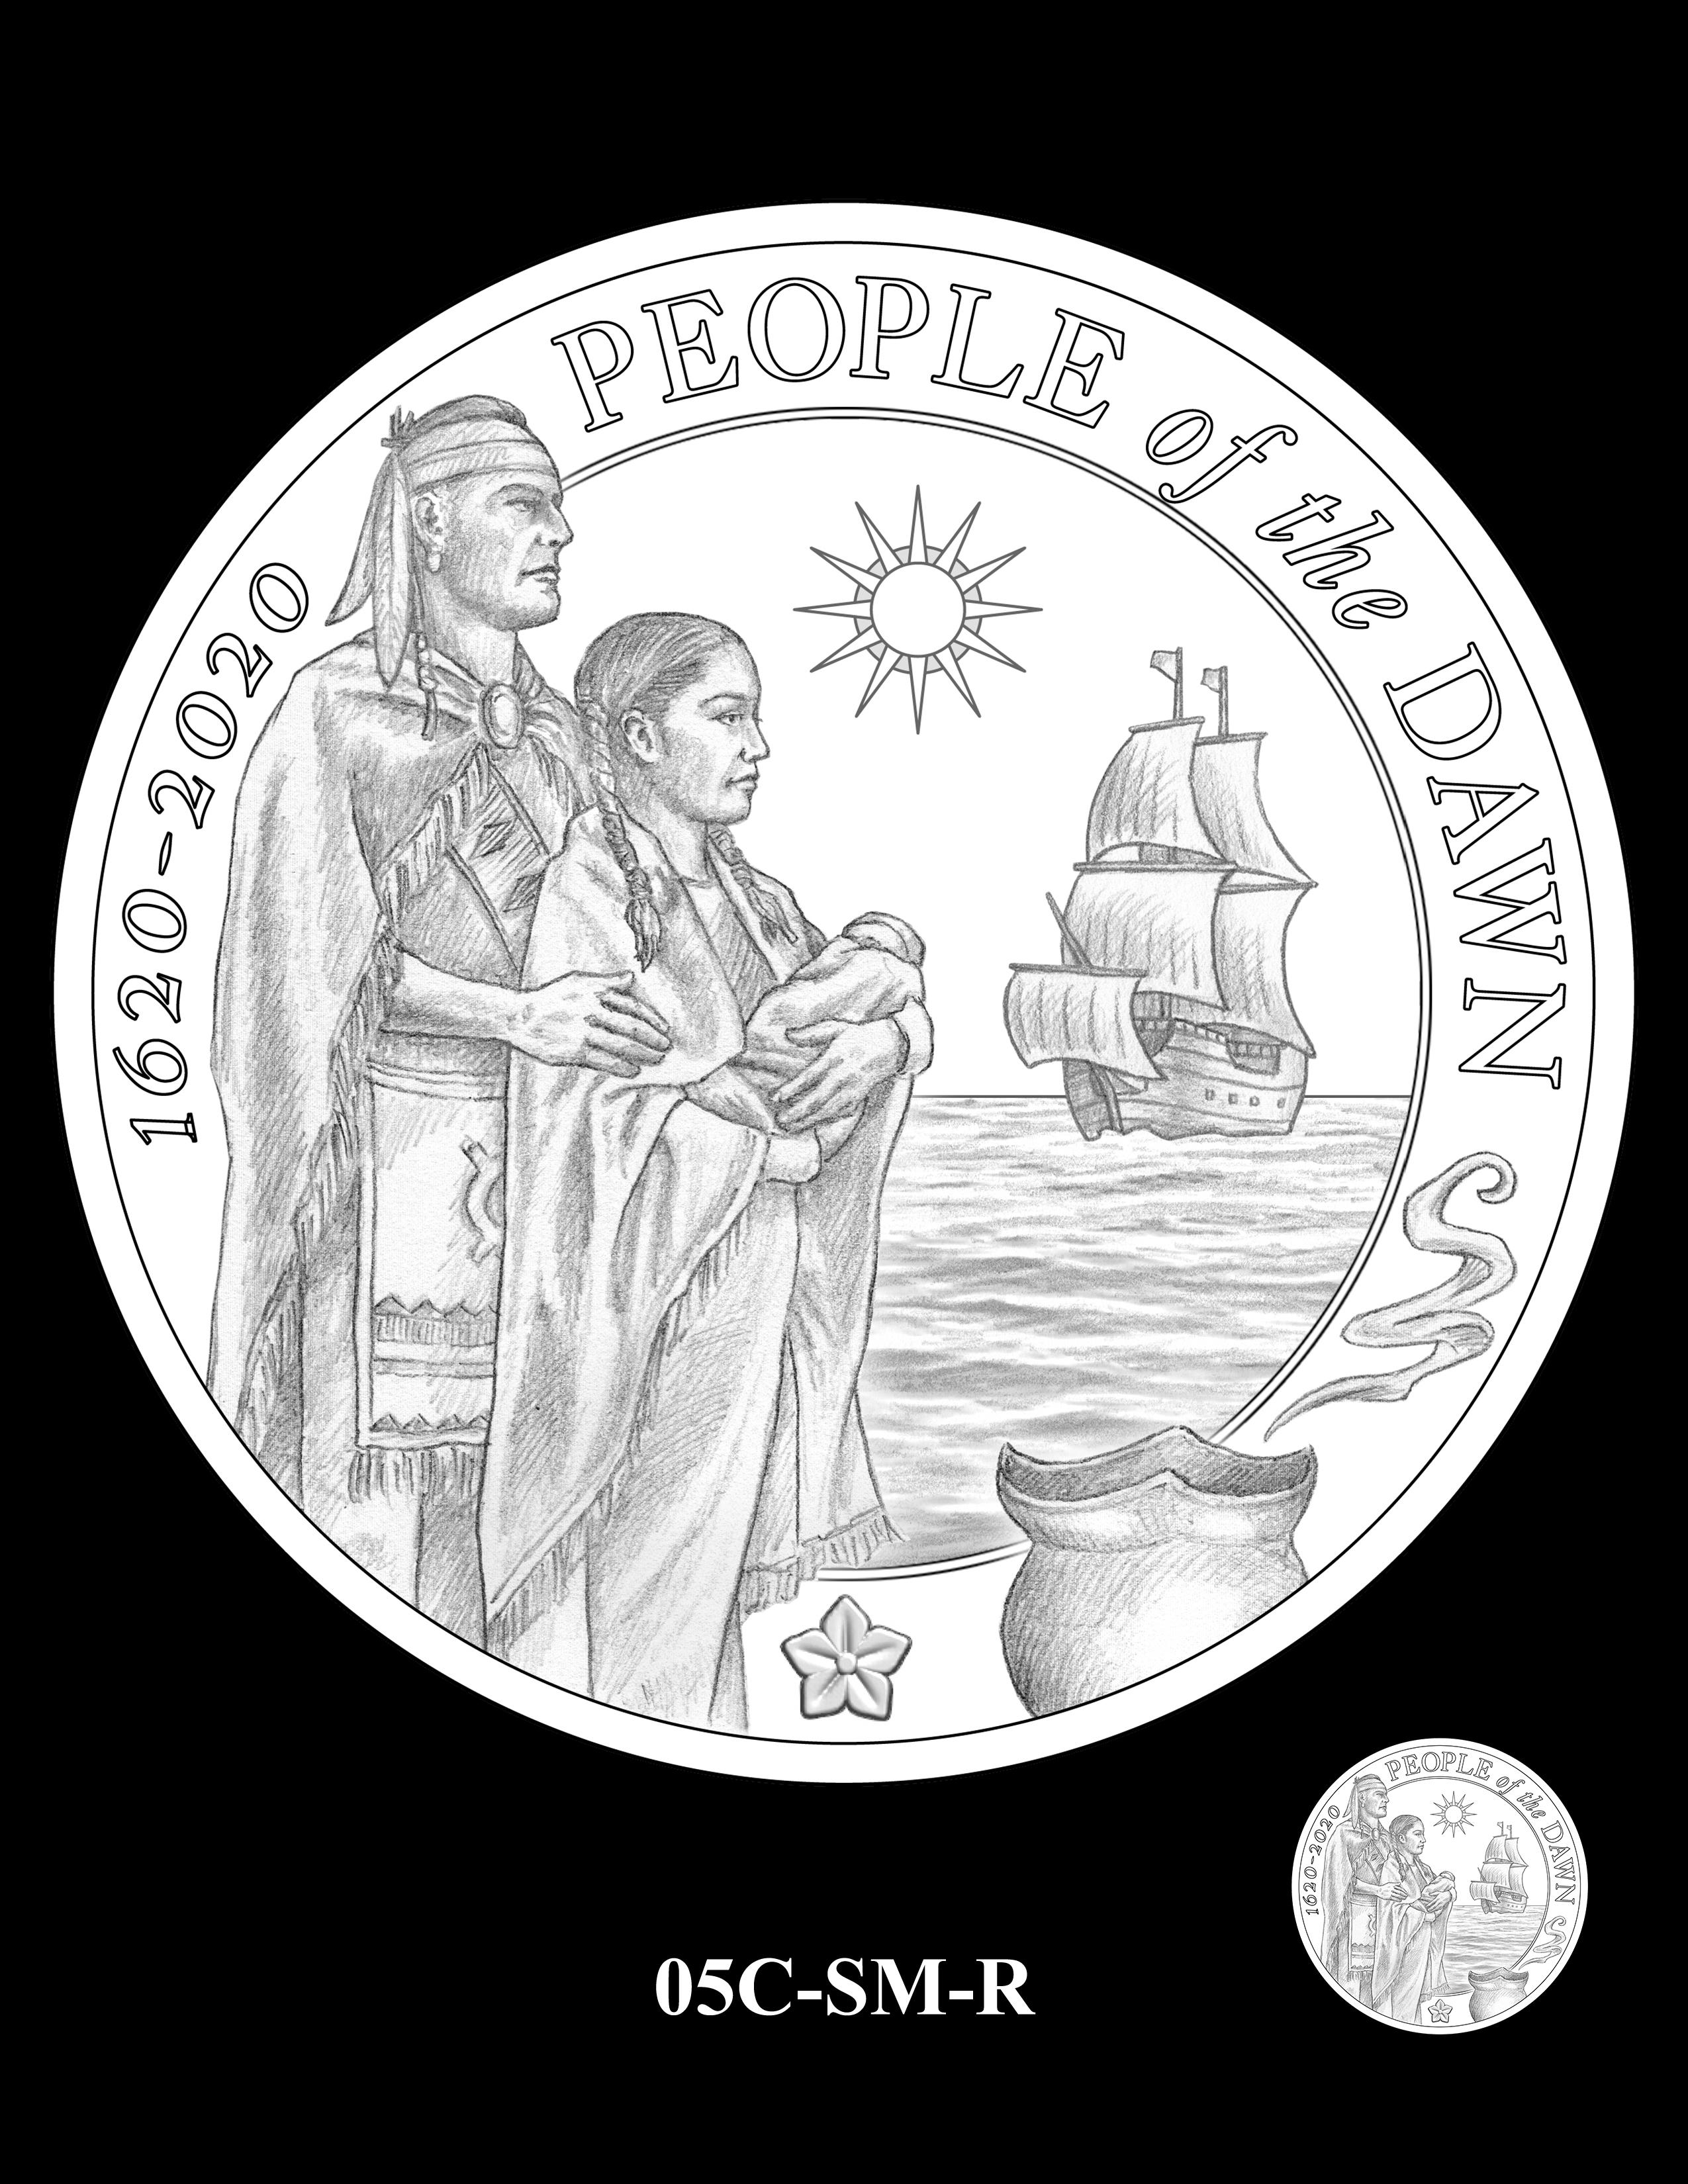 05C-SM-R - 2020 Mayflower 400th Anniversary 24K Gold Coin & Silver Medal Program